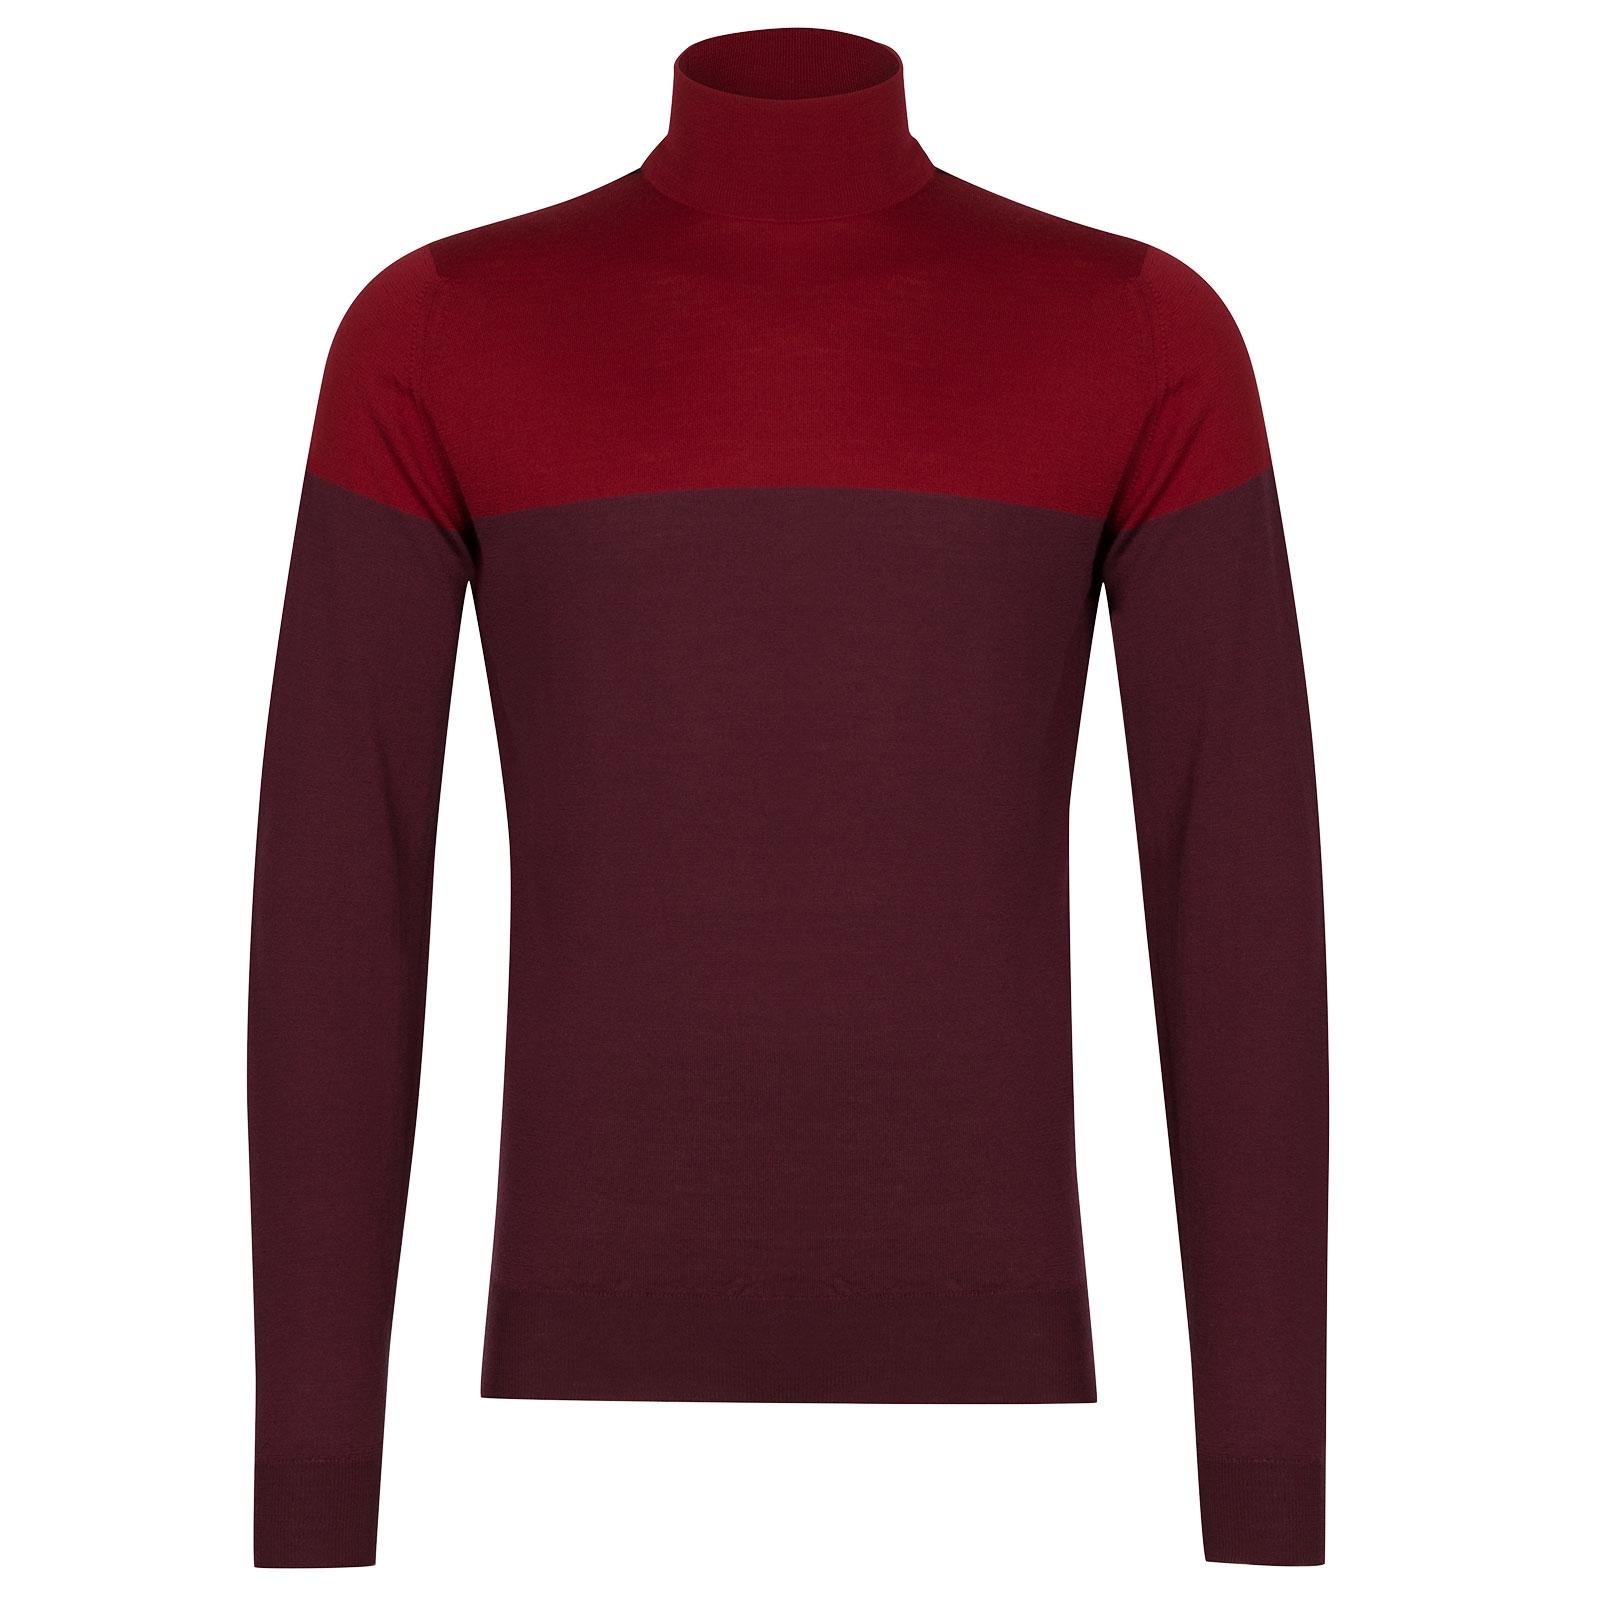 John Smedley Iago Extra Fine Merino Pullover in Bordeaux-XL